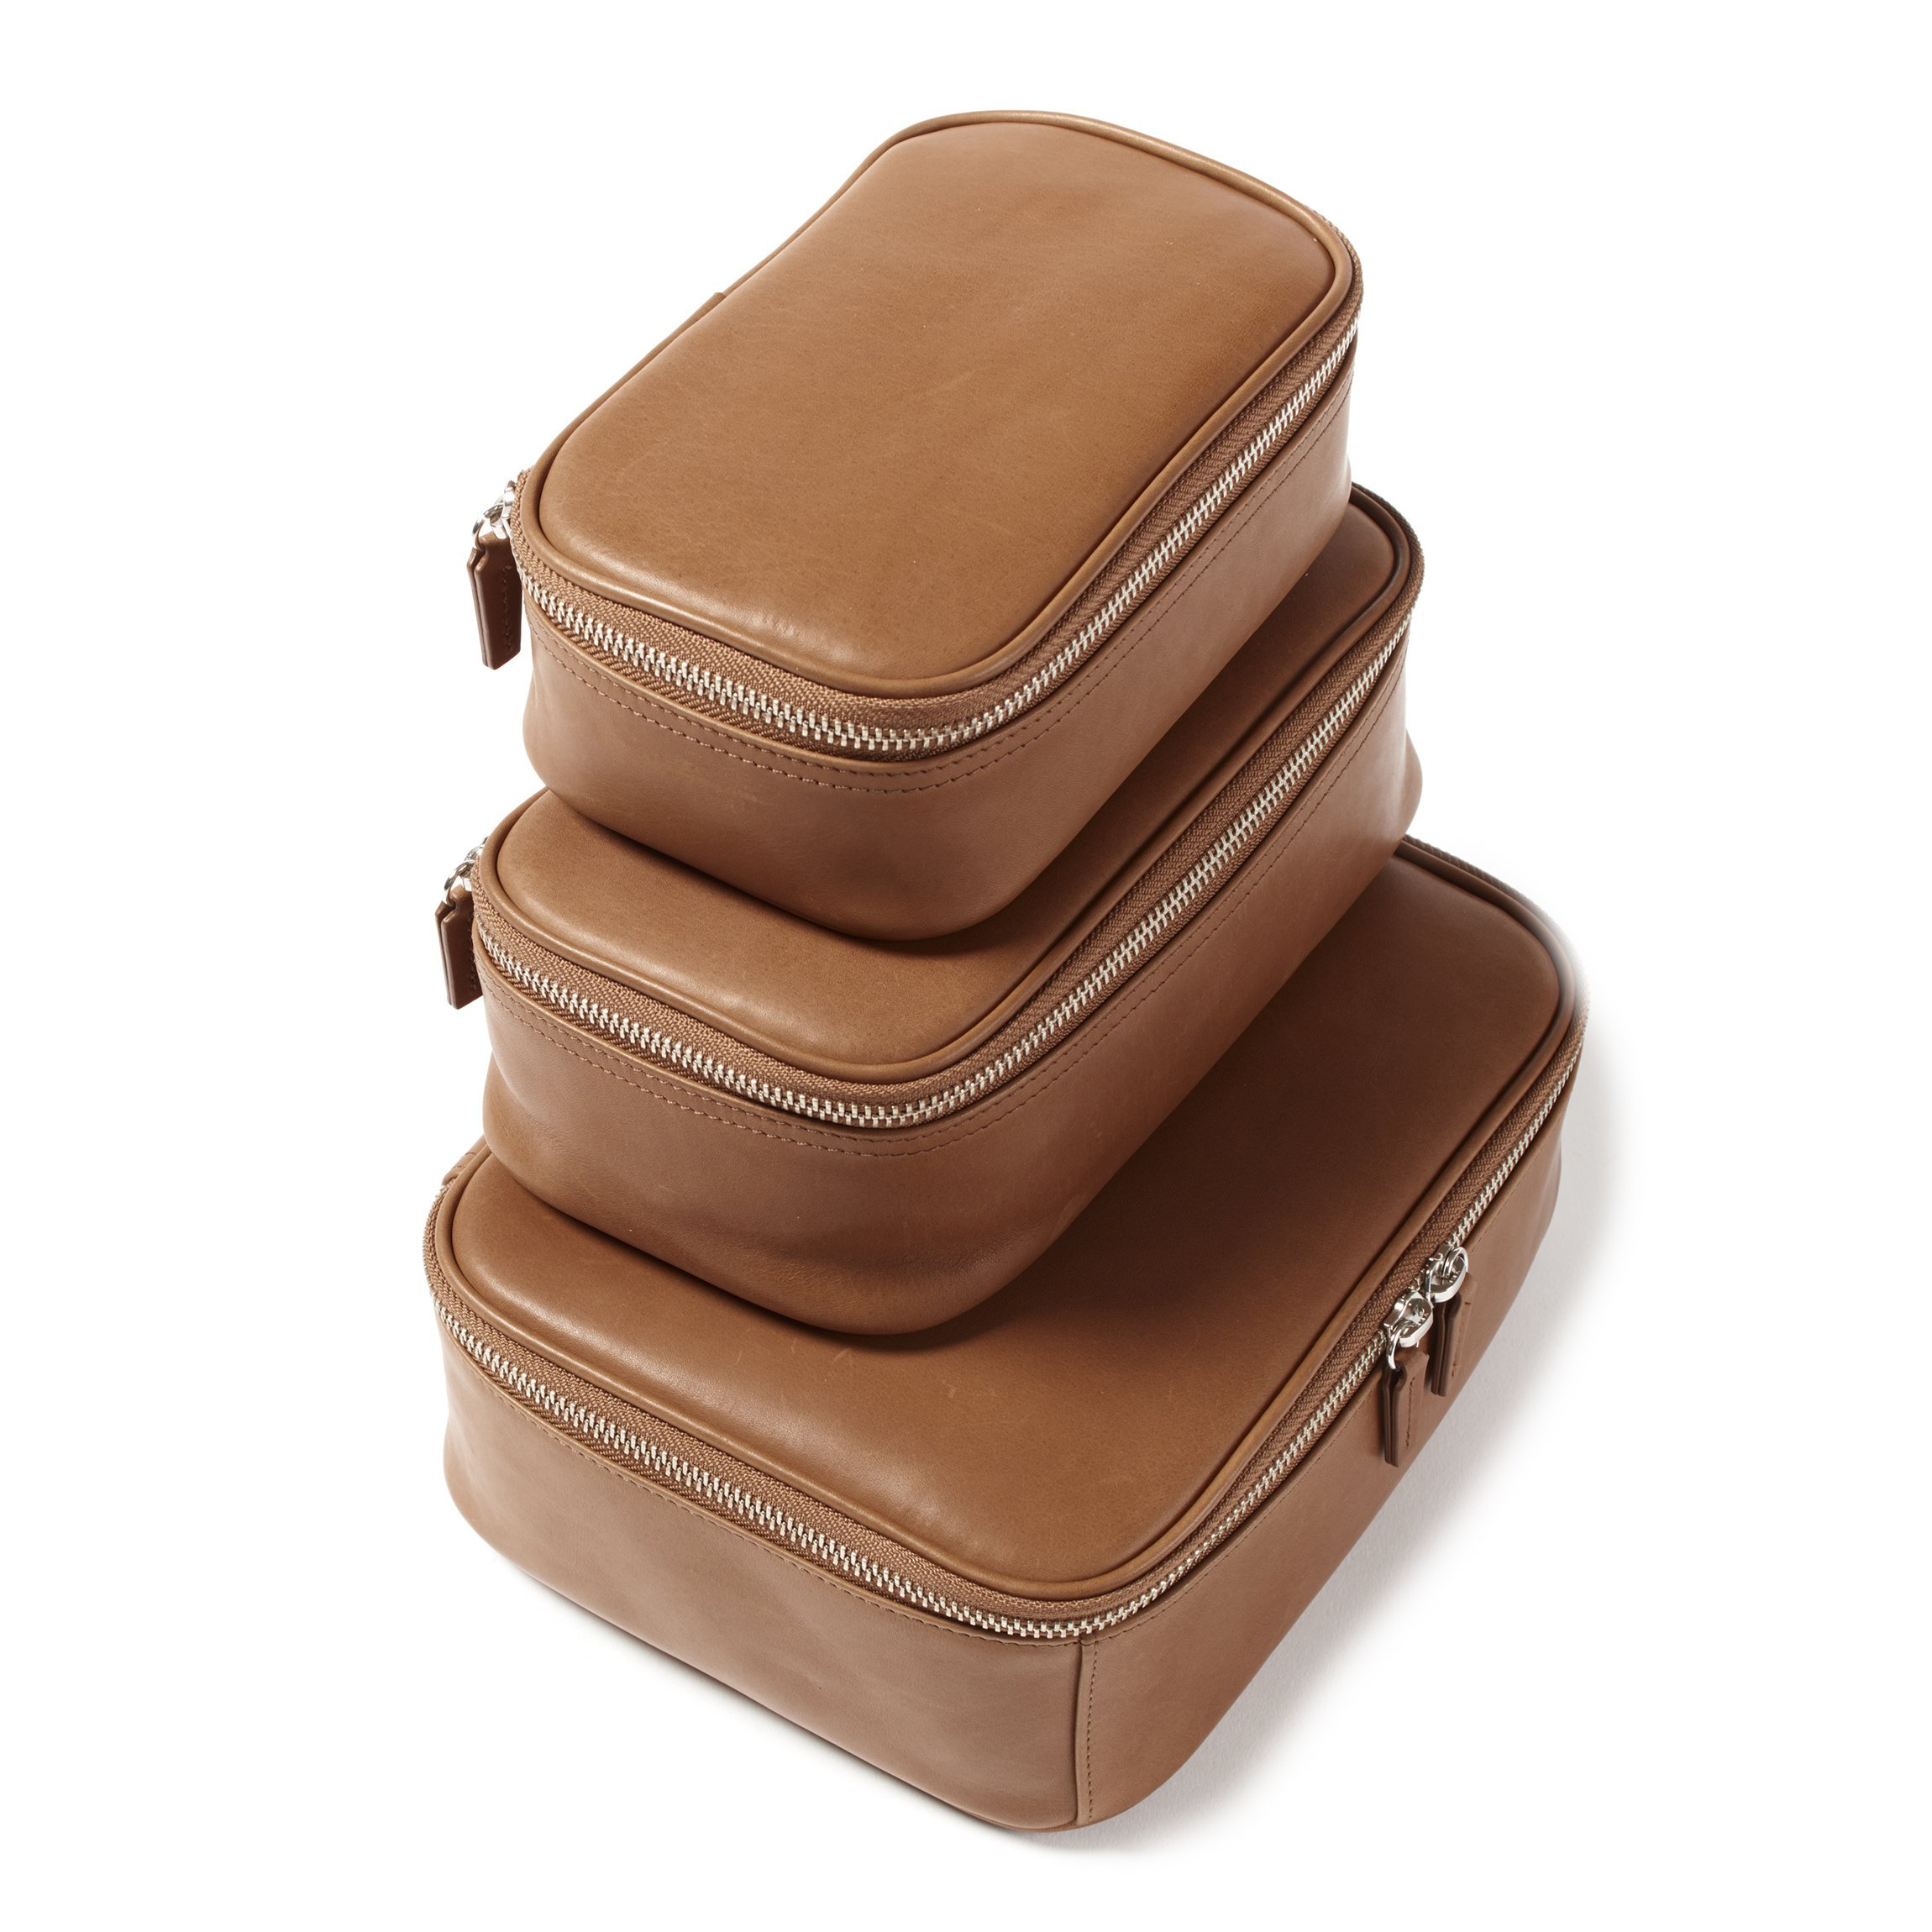 Leatherology Nested Travel Organizer Trio - Full Grain German Leather Leather - Dark Caramel (brown)